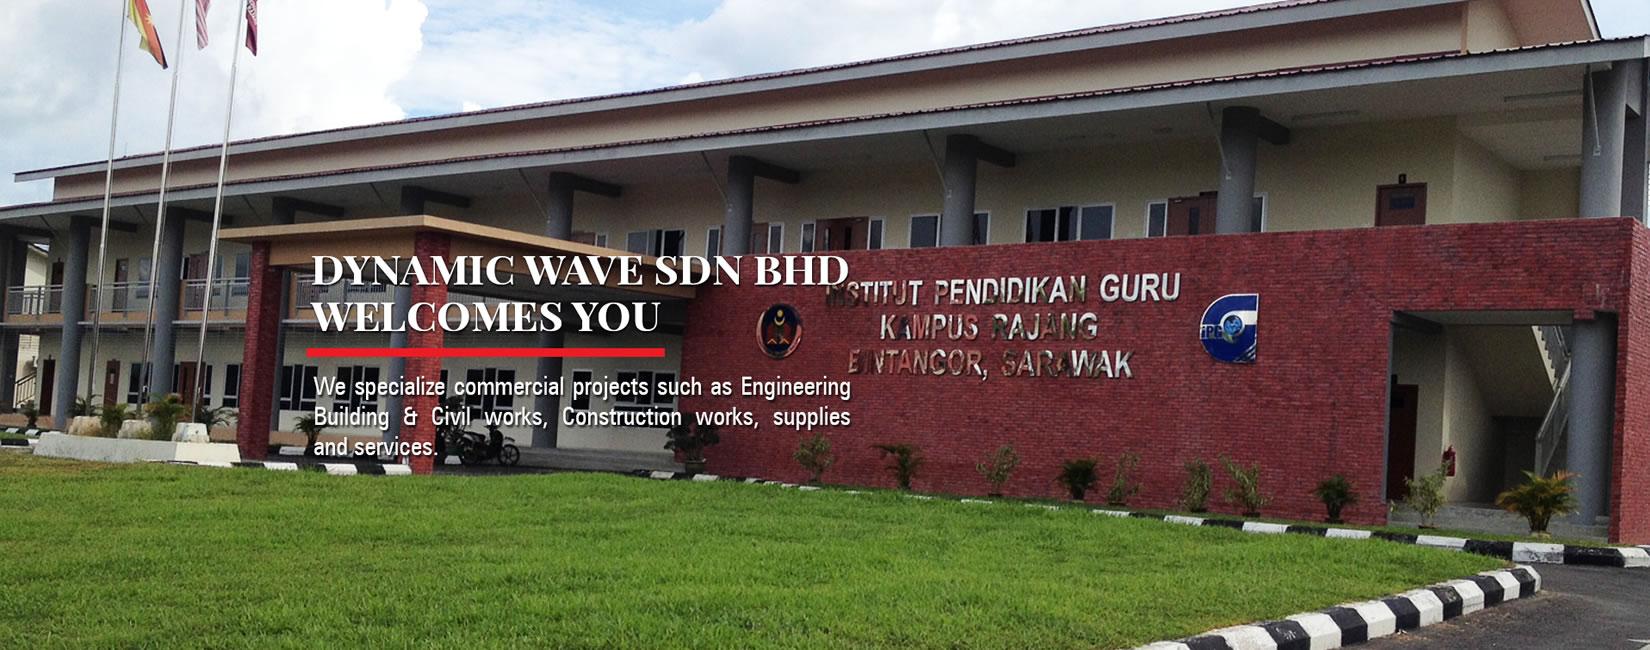 Dynamic Wave Sdn. Bhd. (Kuching)